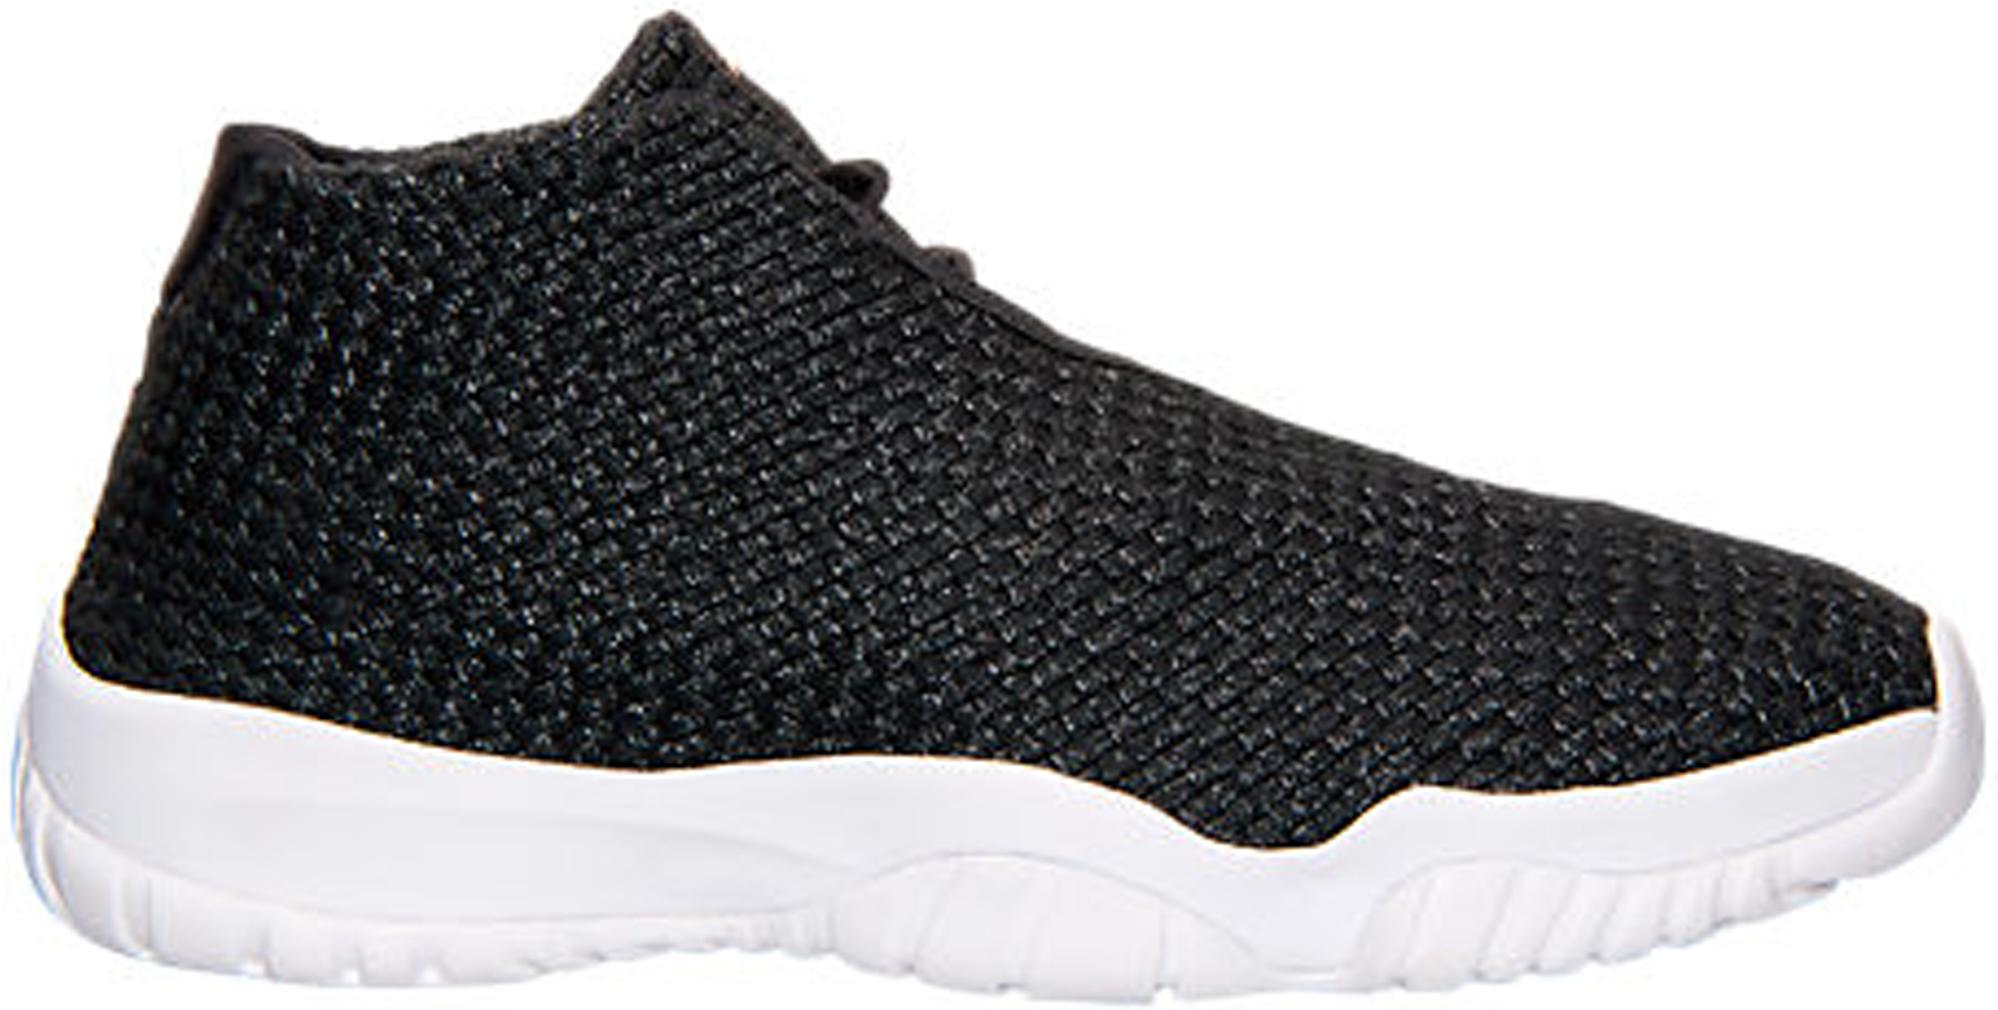 dabf68ddb3073 Jordan 4s Size 13 American Flag Nike Shoes